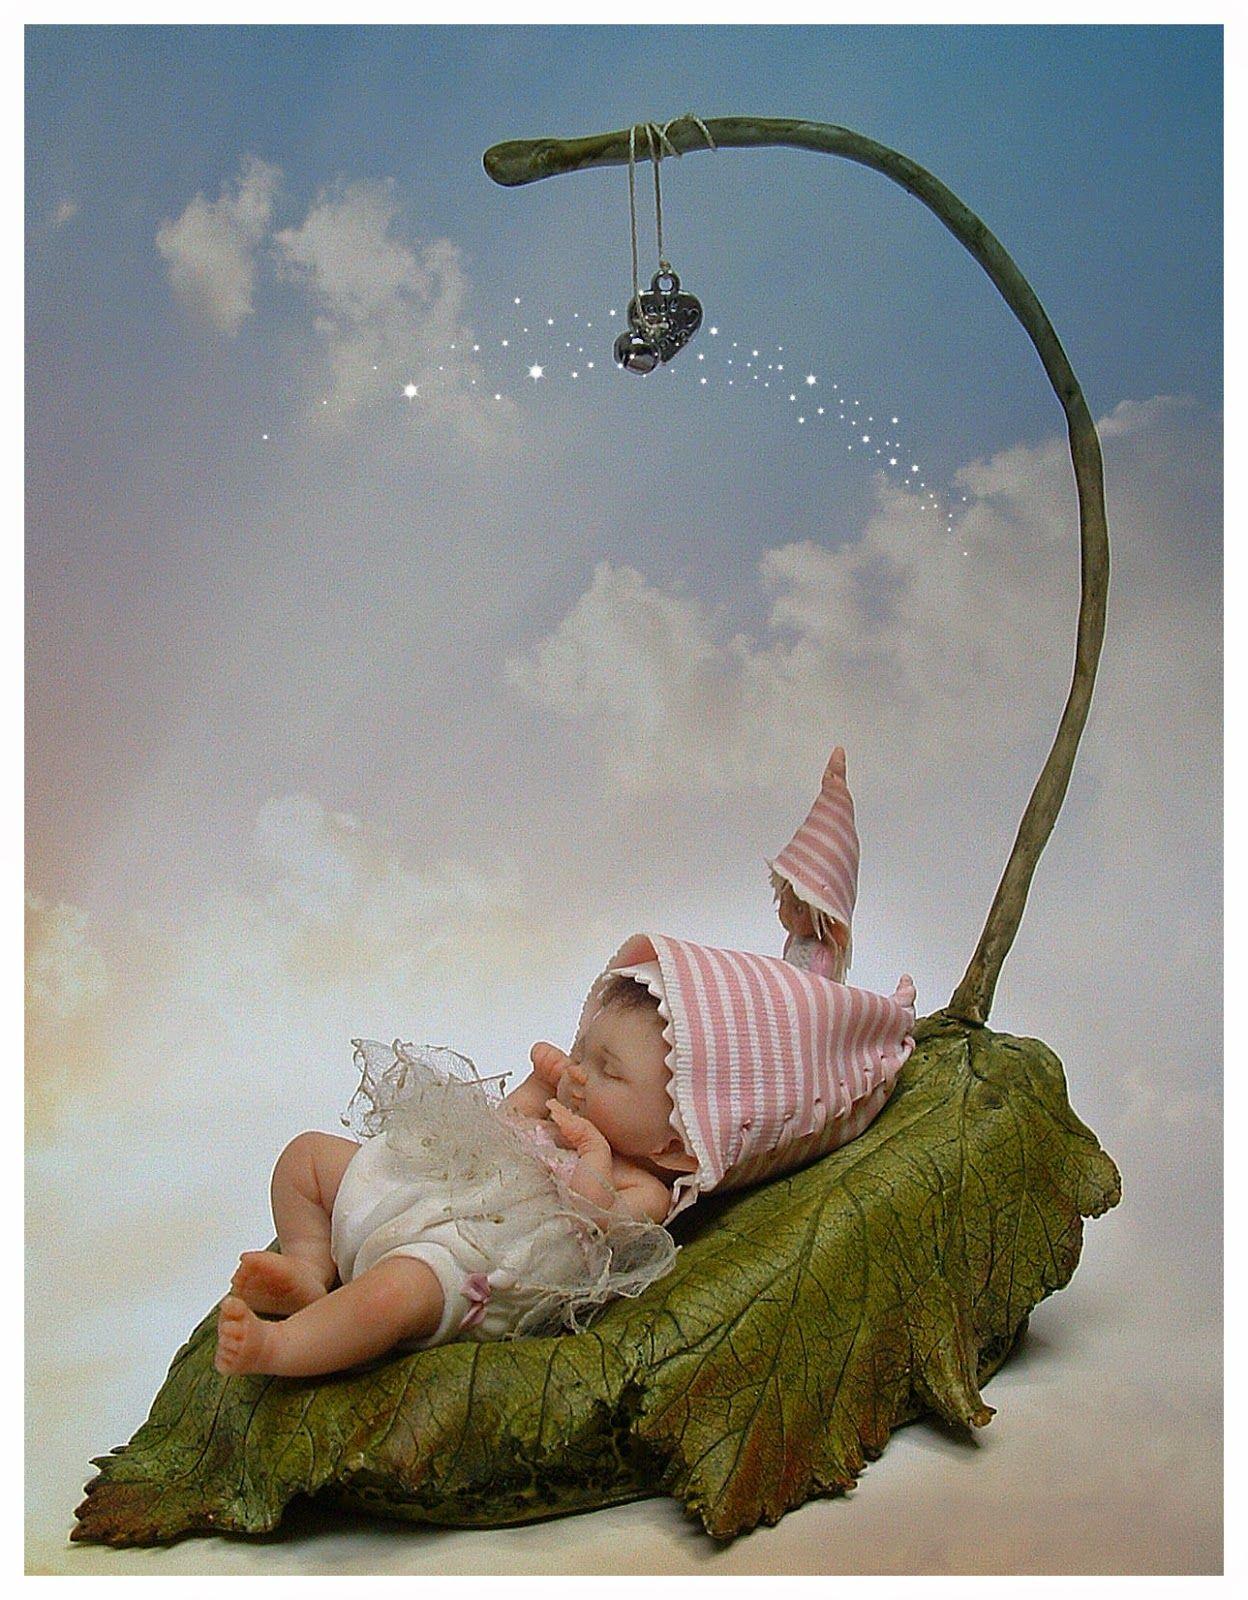 enaidsworld: fairy baby's  modelling  Pinterest  요정, 천사 및 사람